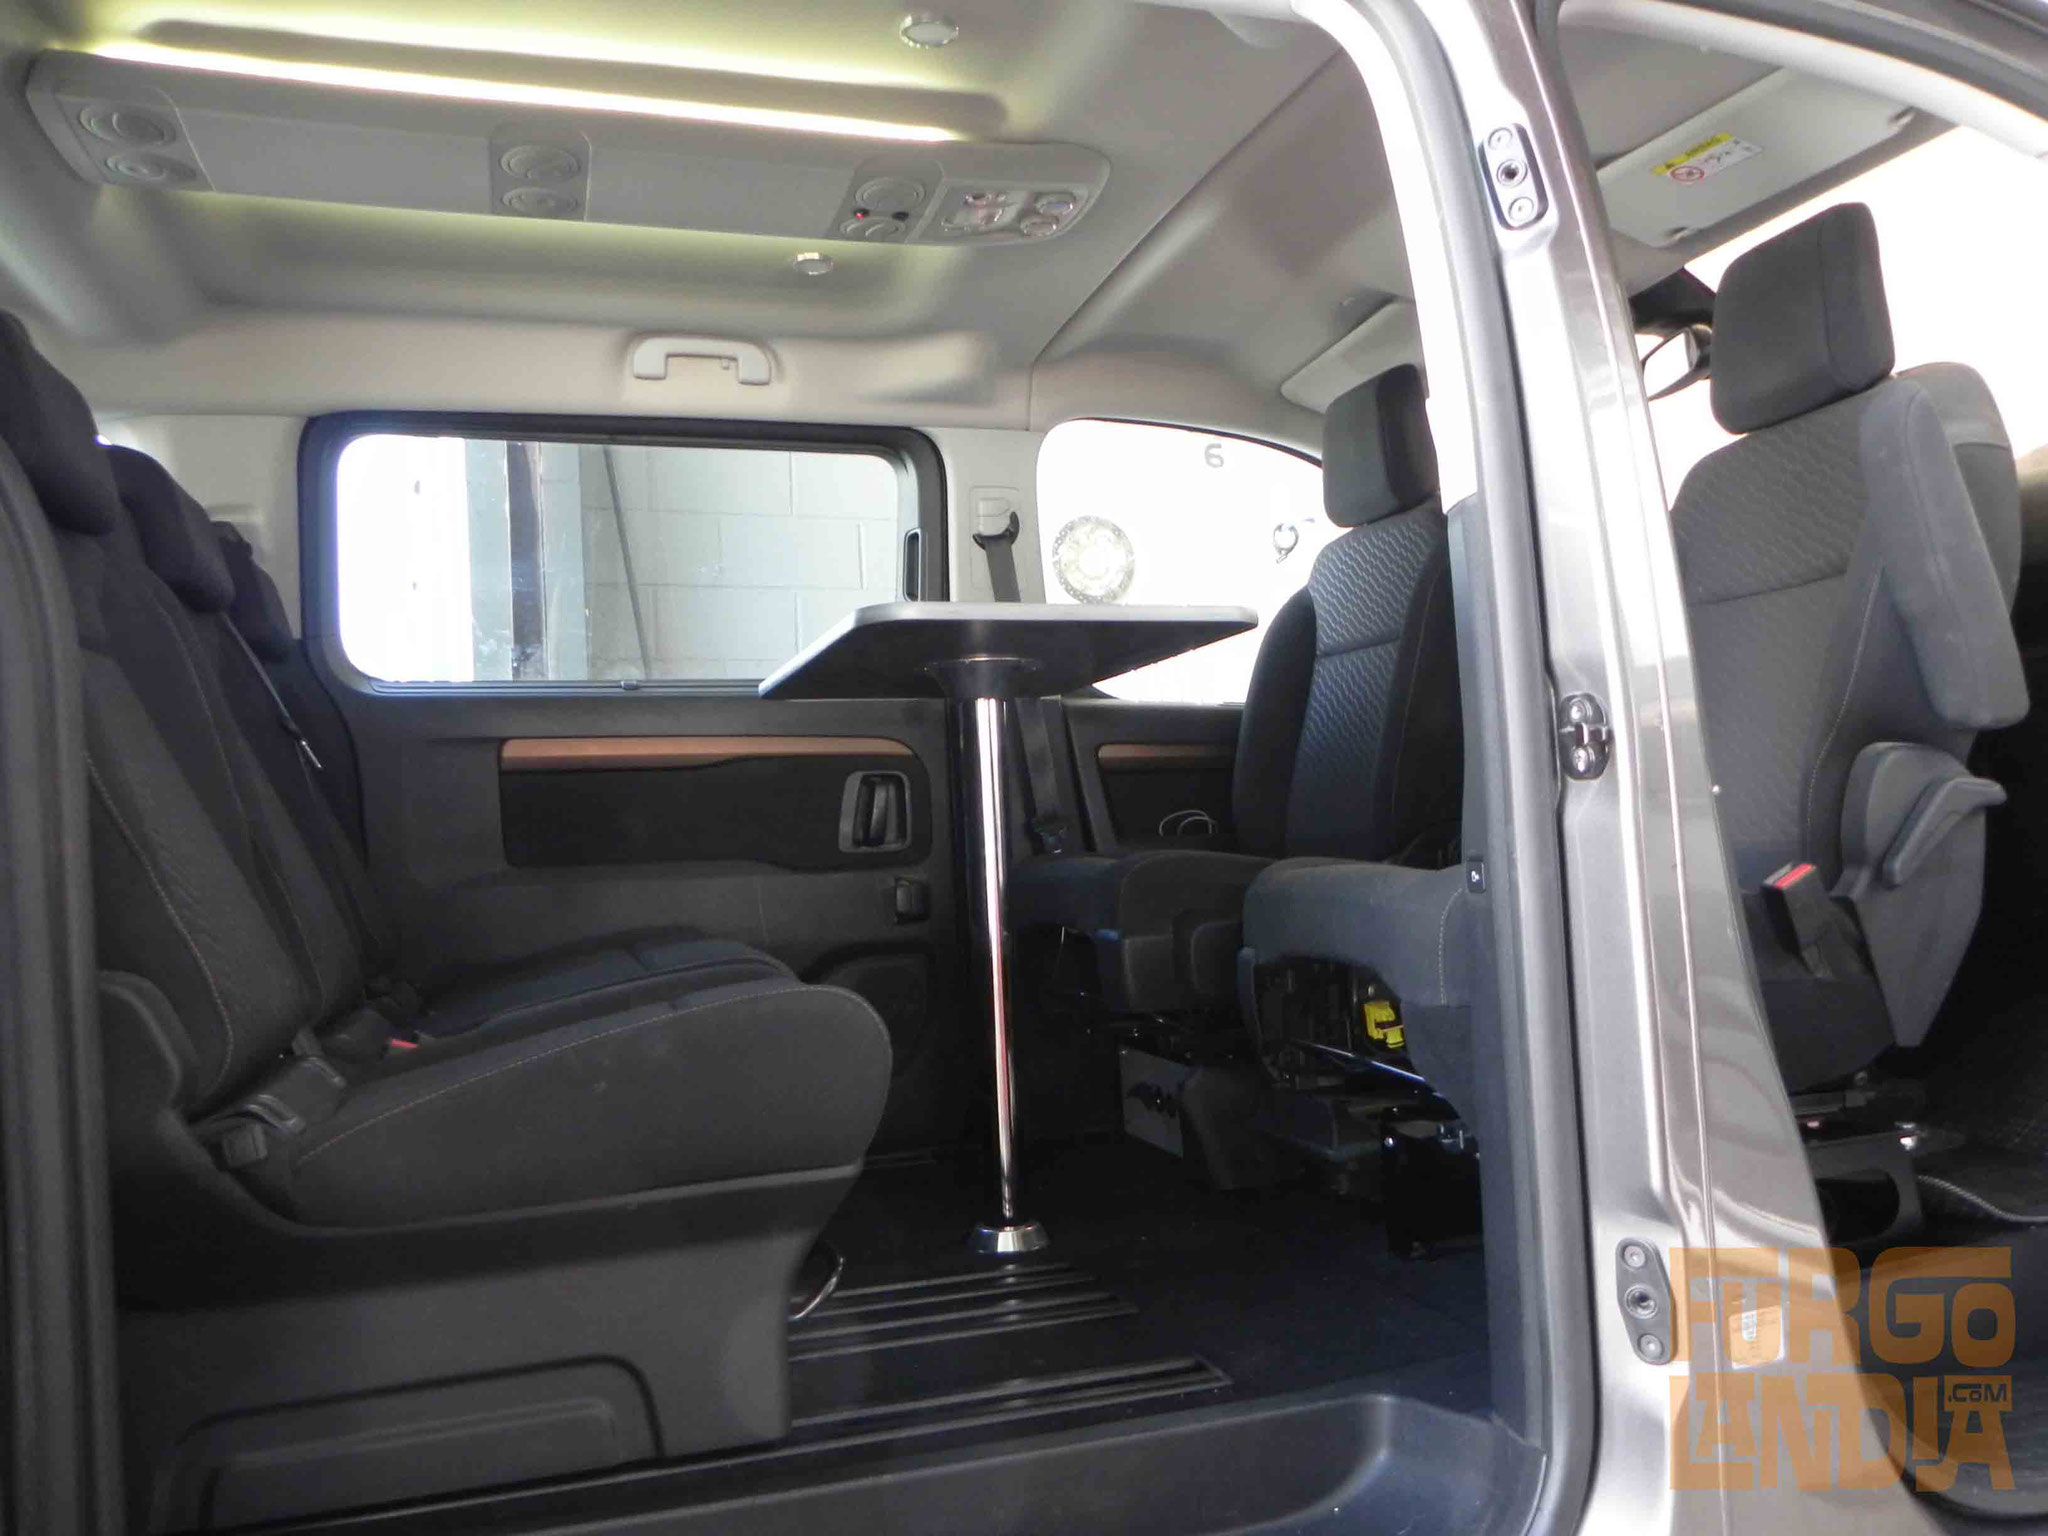 Camperización Toyota Proace / Citroën Spacetourer / Peugeot Traveller